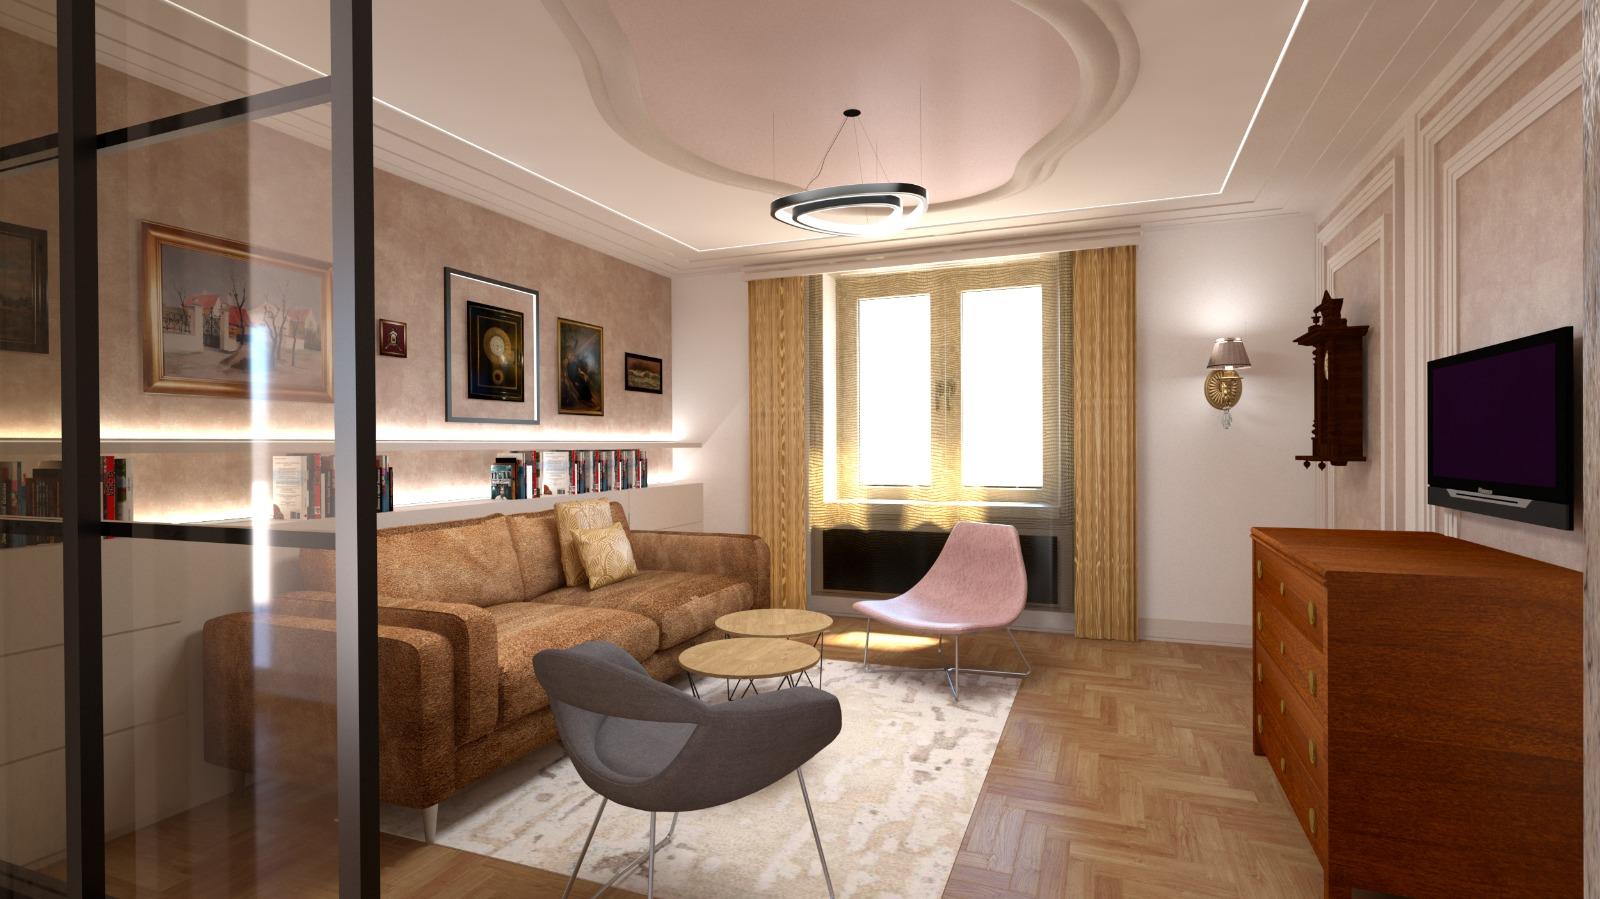 Návrh interiéru luxusního bytu v Praze5